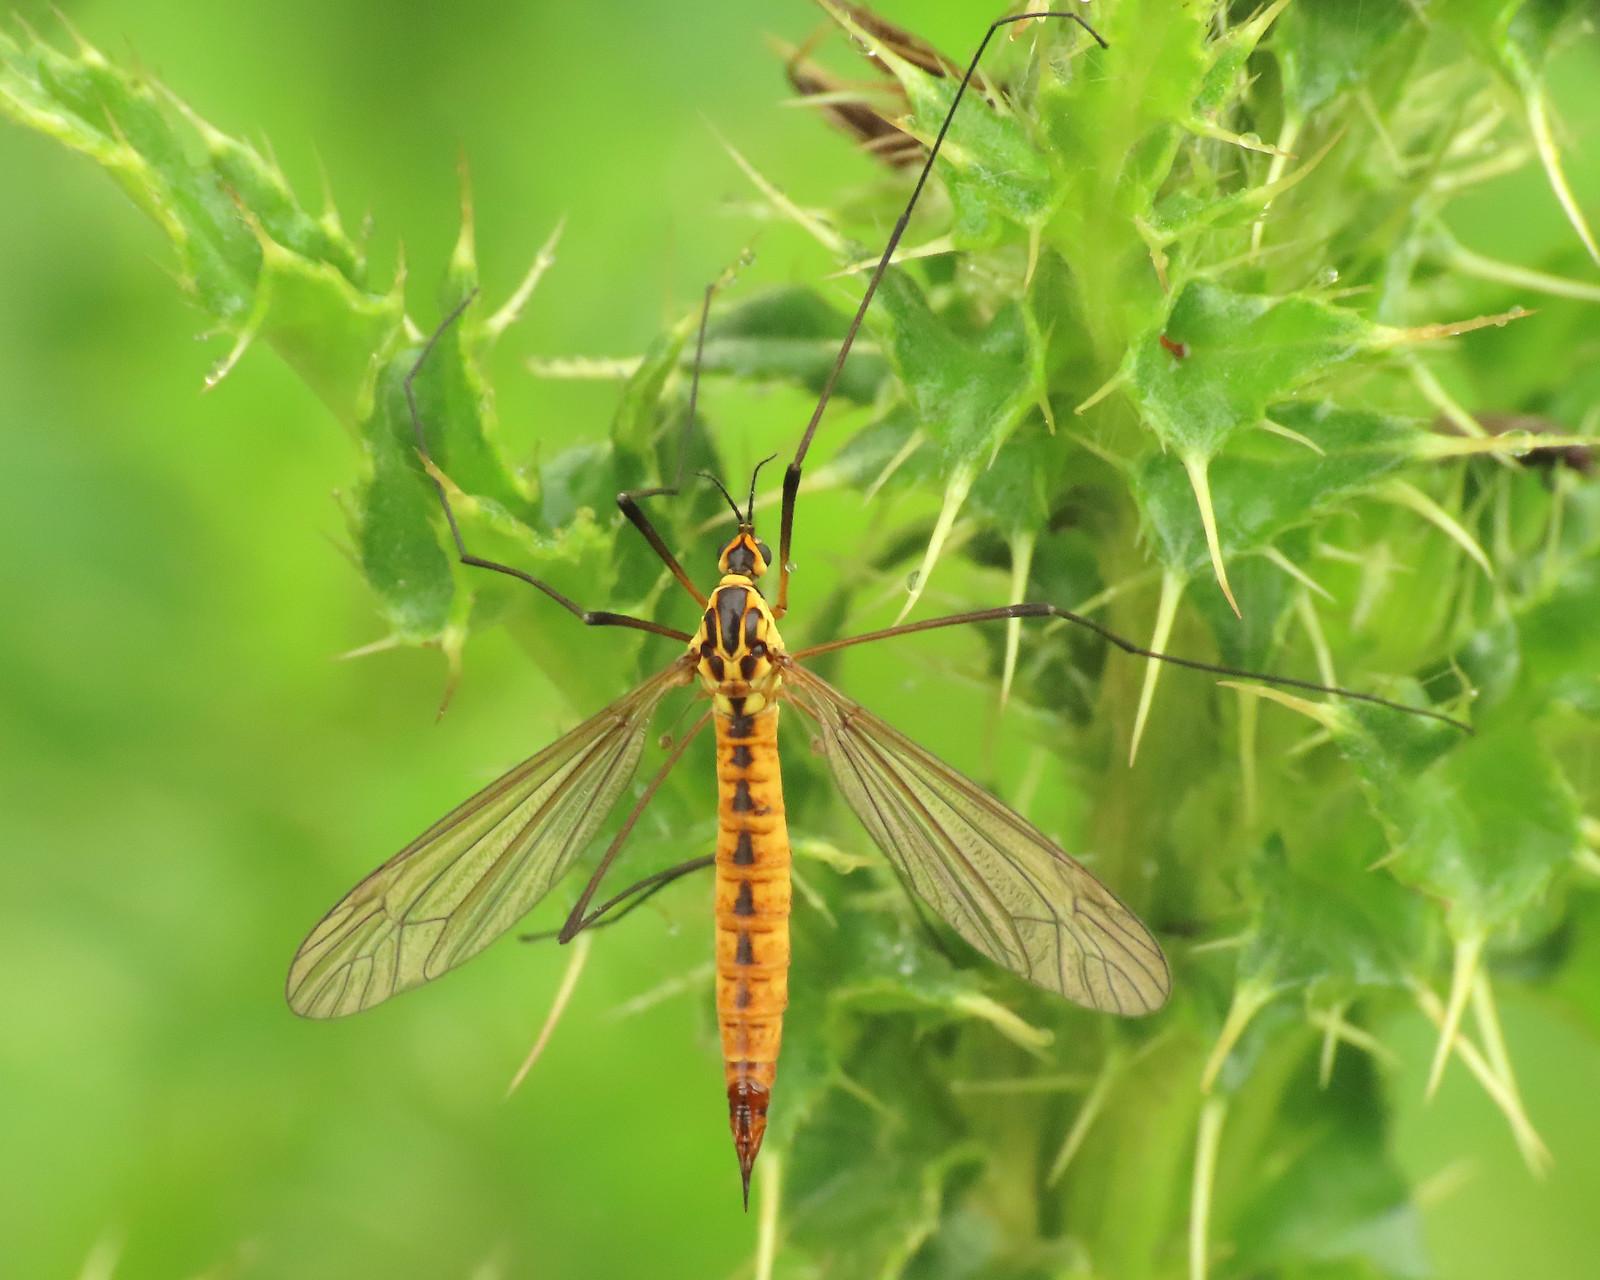 Tiger Cranefly - Nephrotoma flavescens